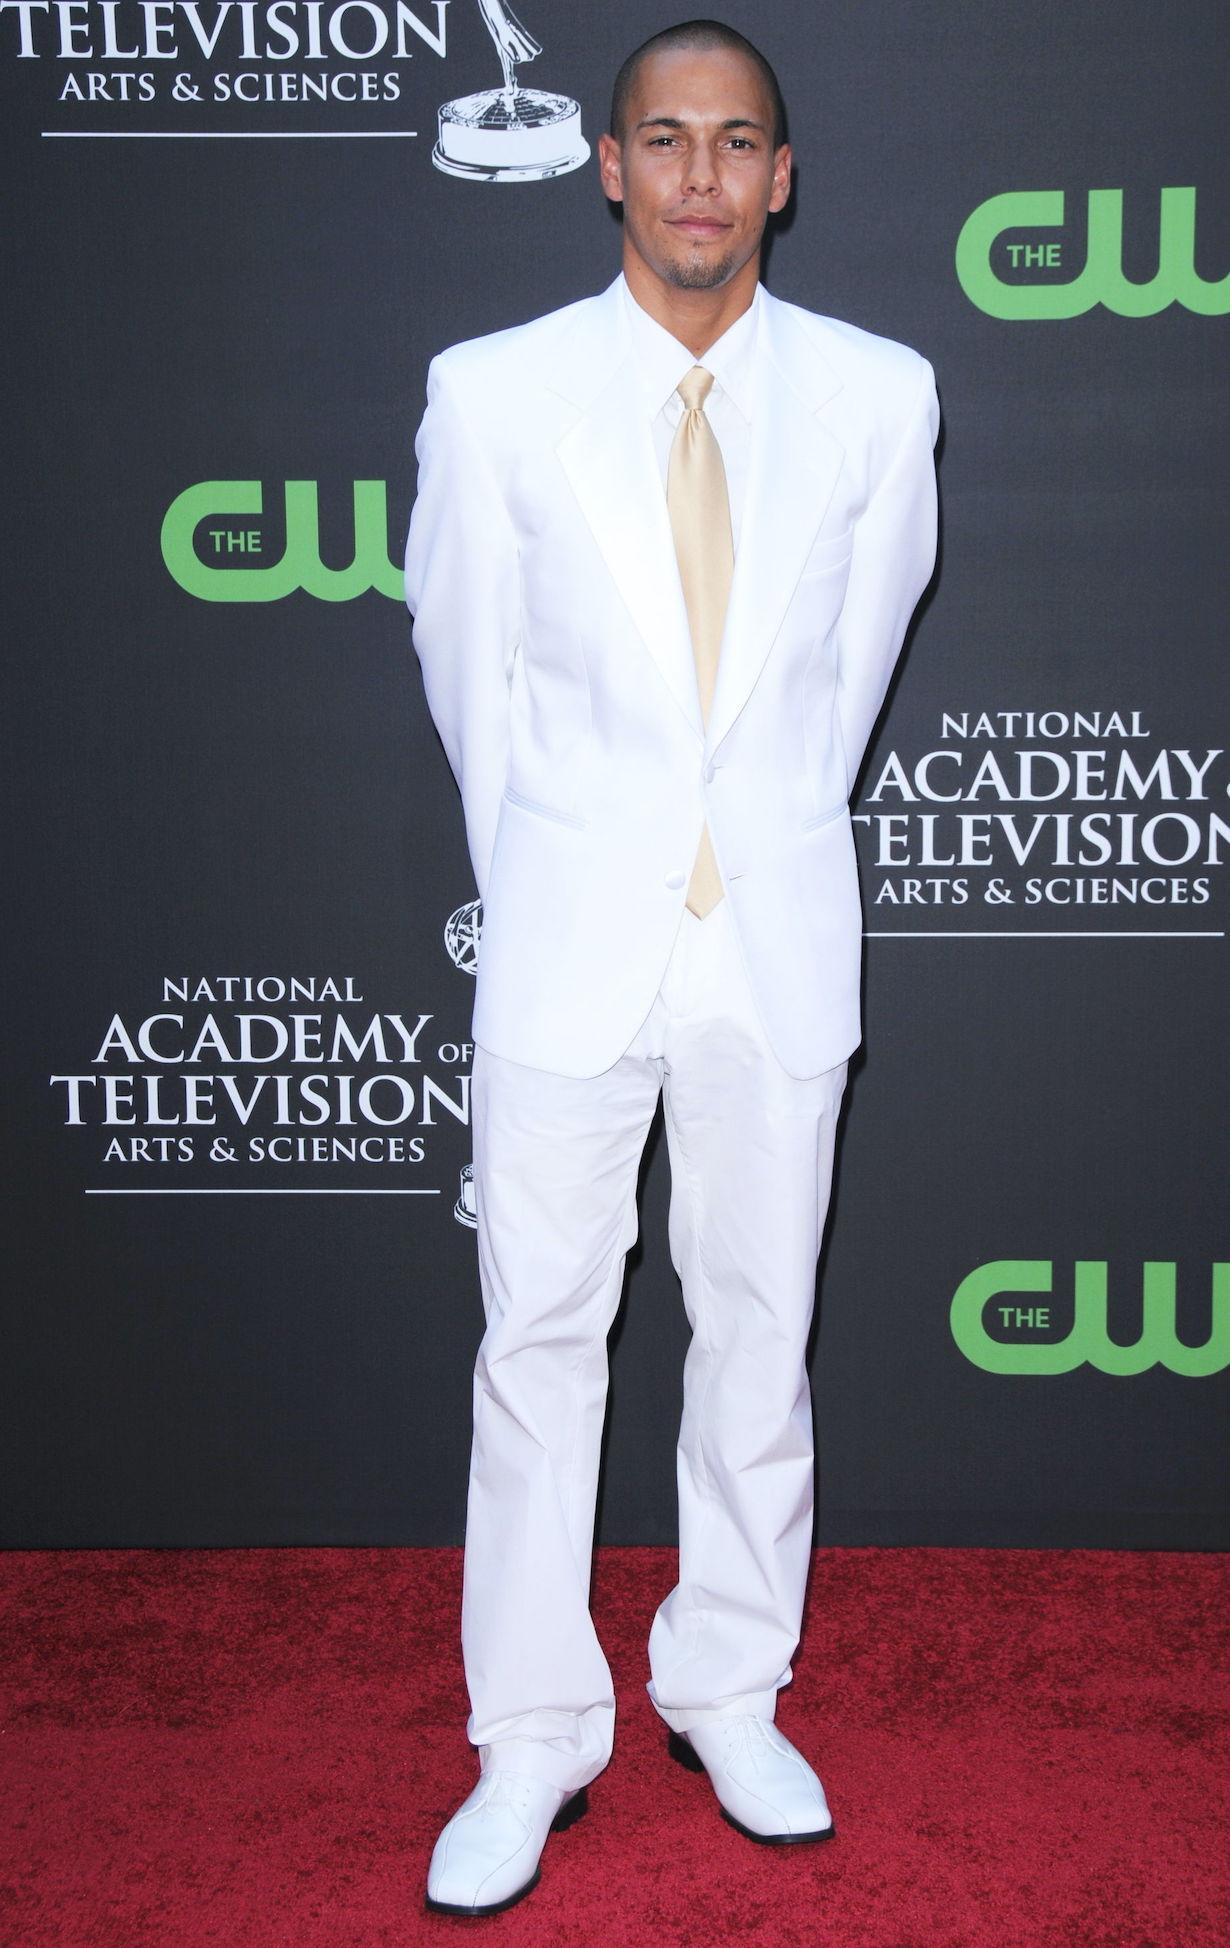 Bryton McClure 36th Annual Daytime Emmy Awards - Arrivals Orpheum Theatre Los Angeles 8/30/09 © Jill Johnson/jpistudios.com 310-657-9661